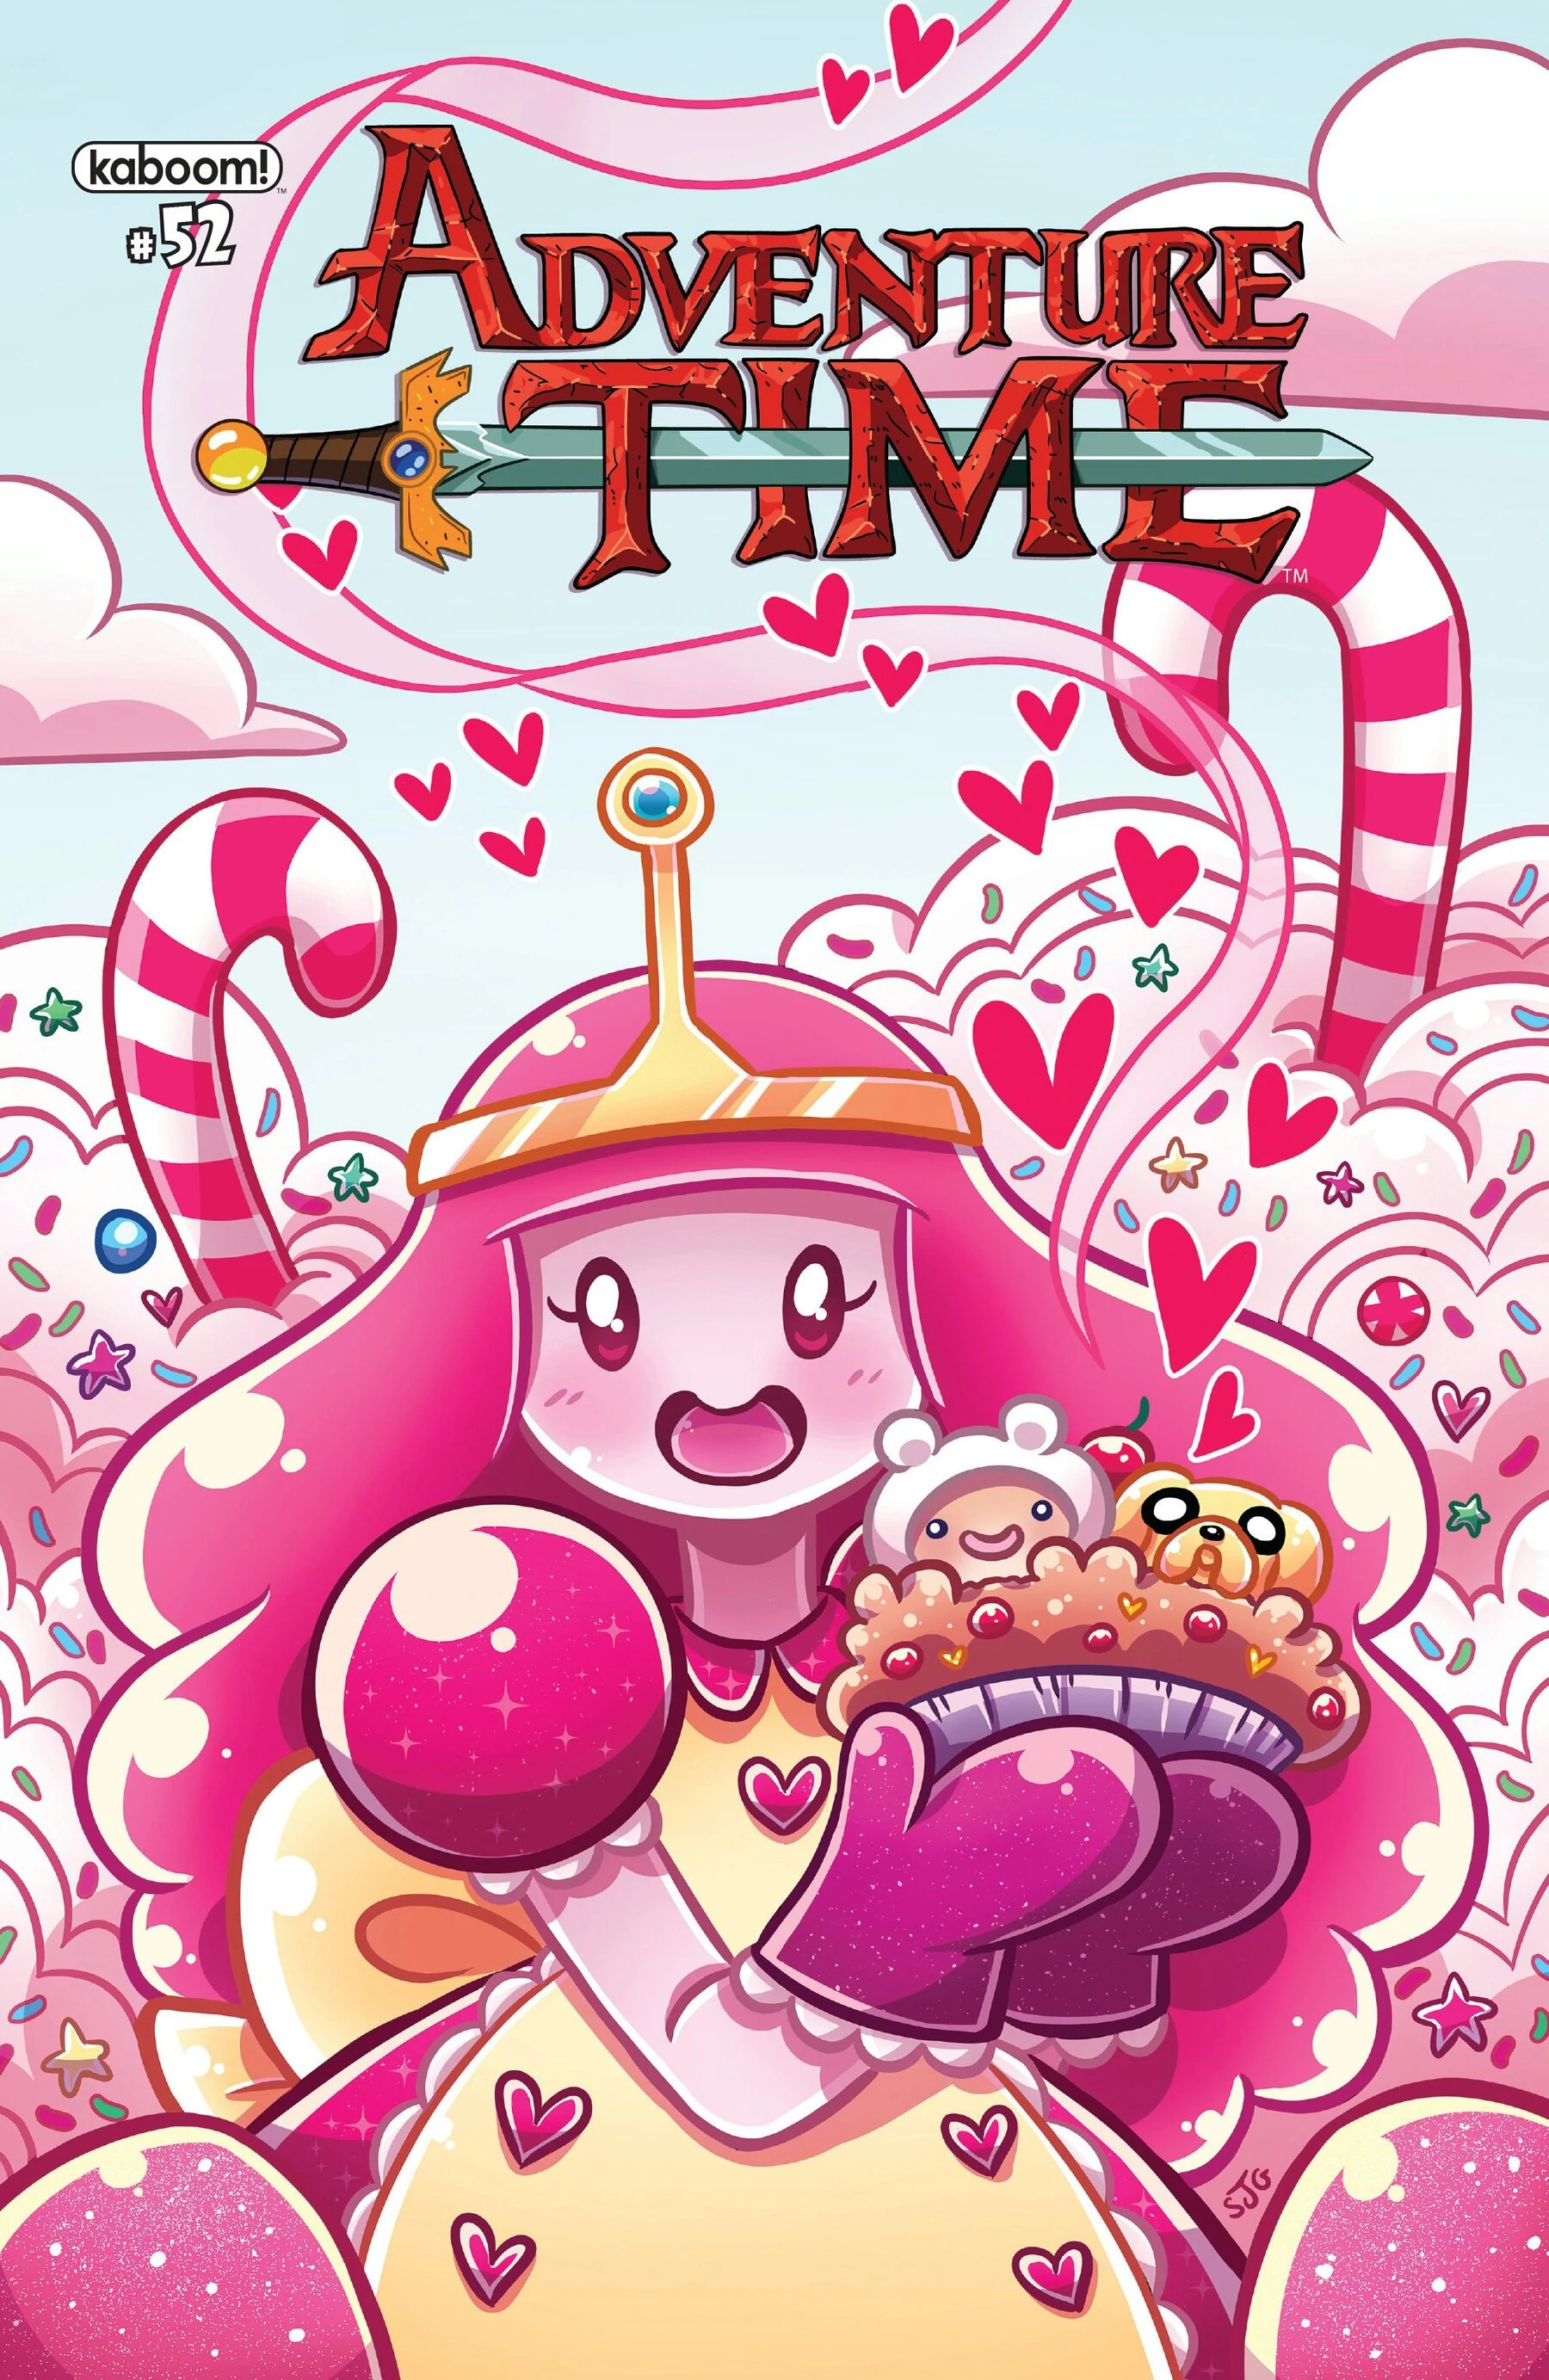 Issue 52 Adventure Time Wiki Fandom Powered By Wikia